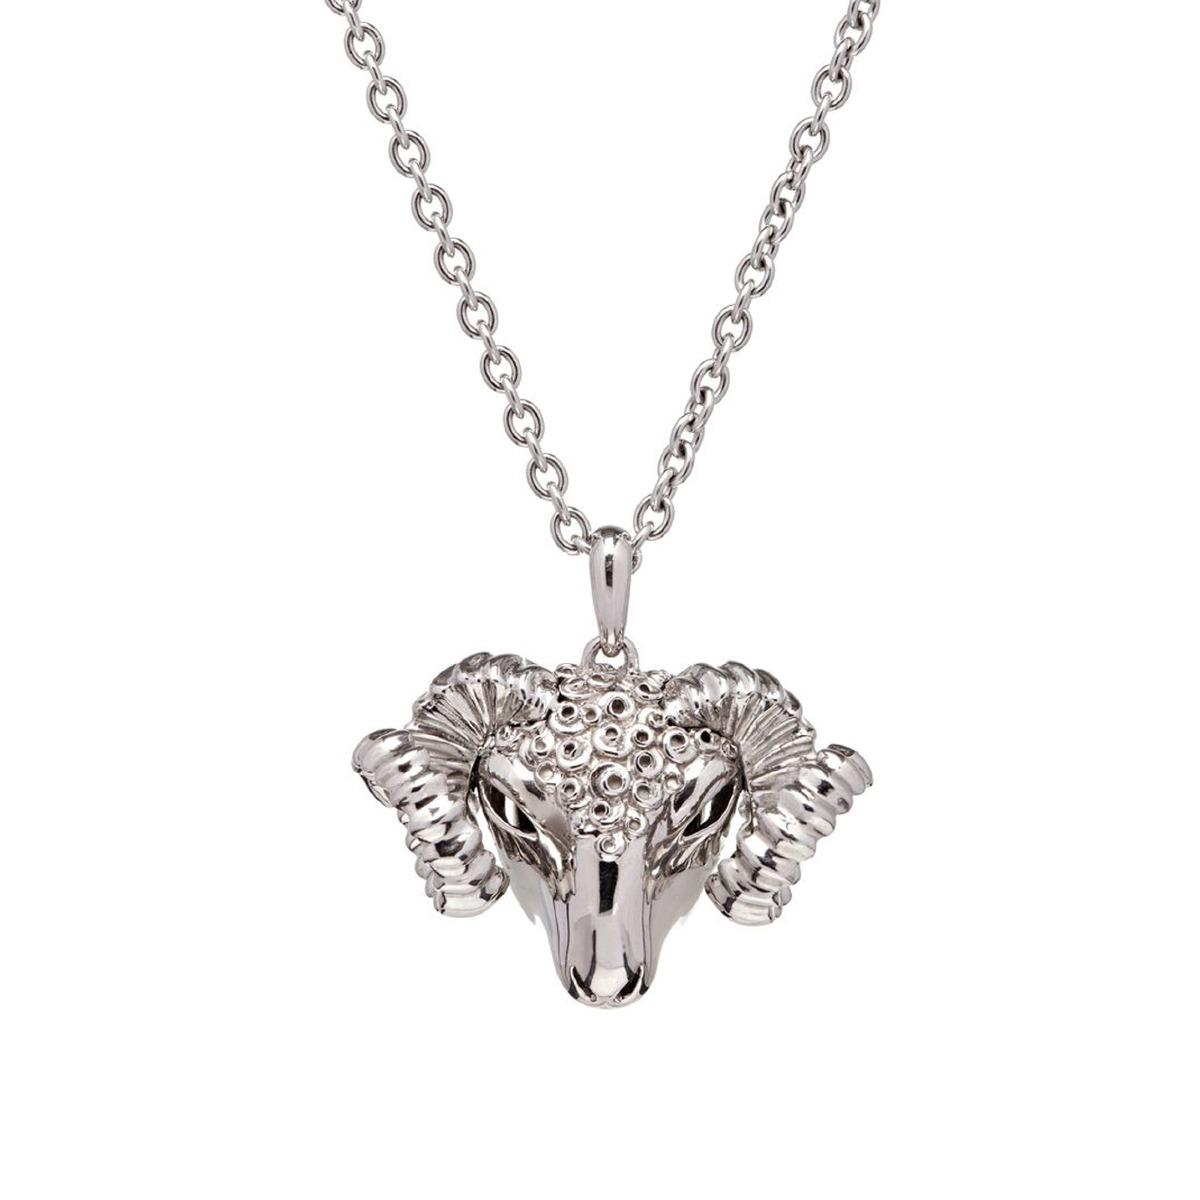 Dionysus Ram Pendant - Silver